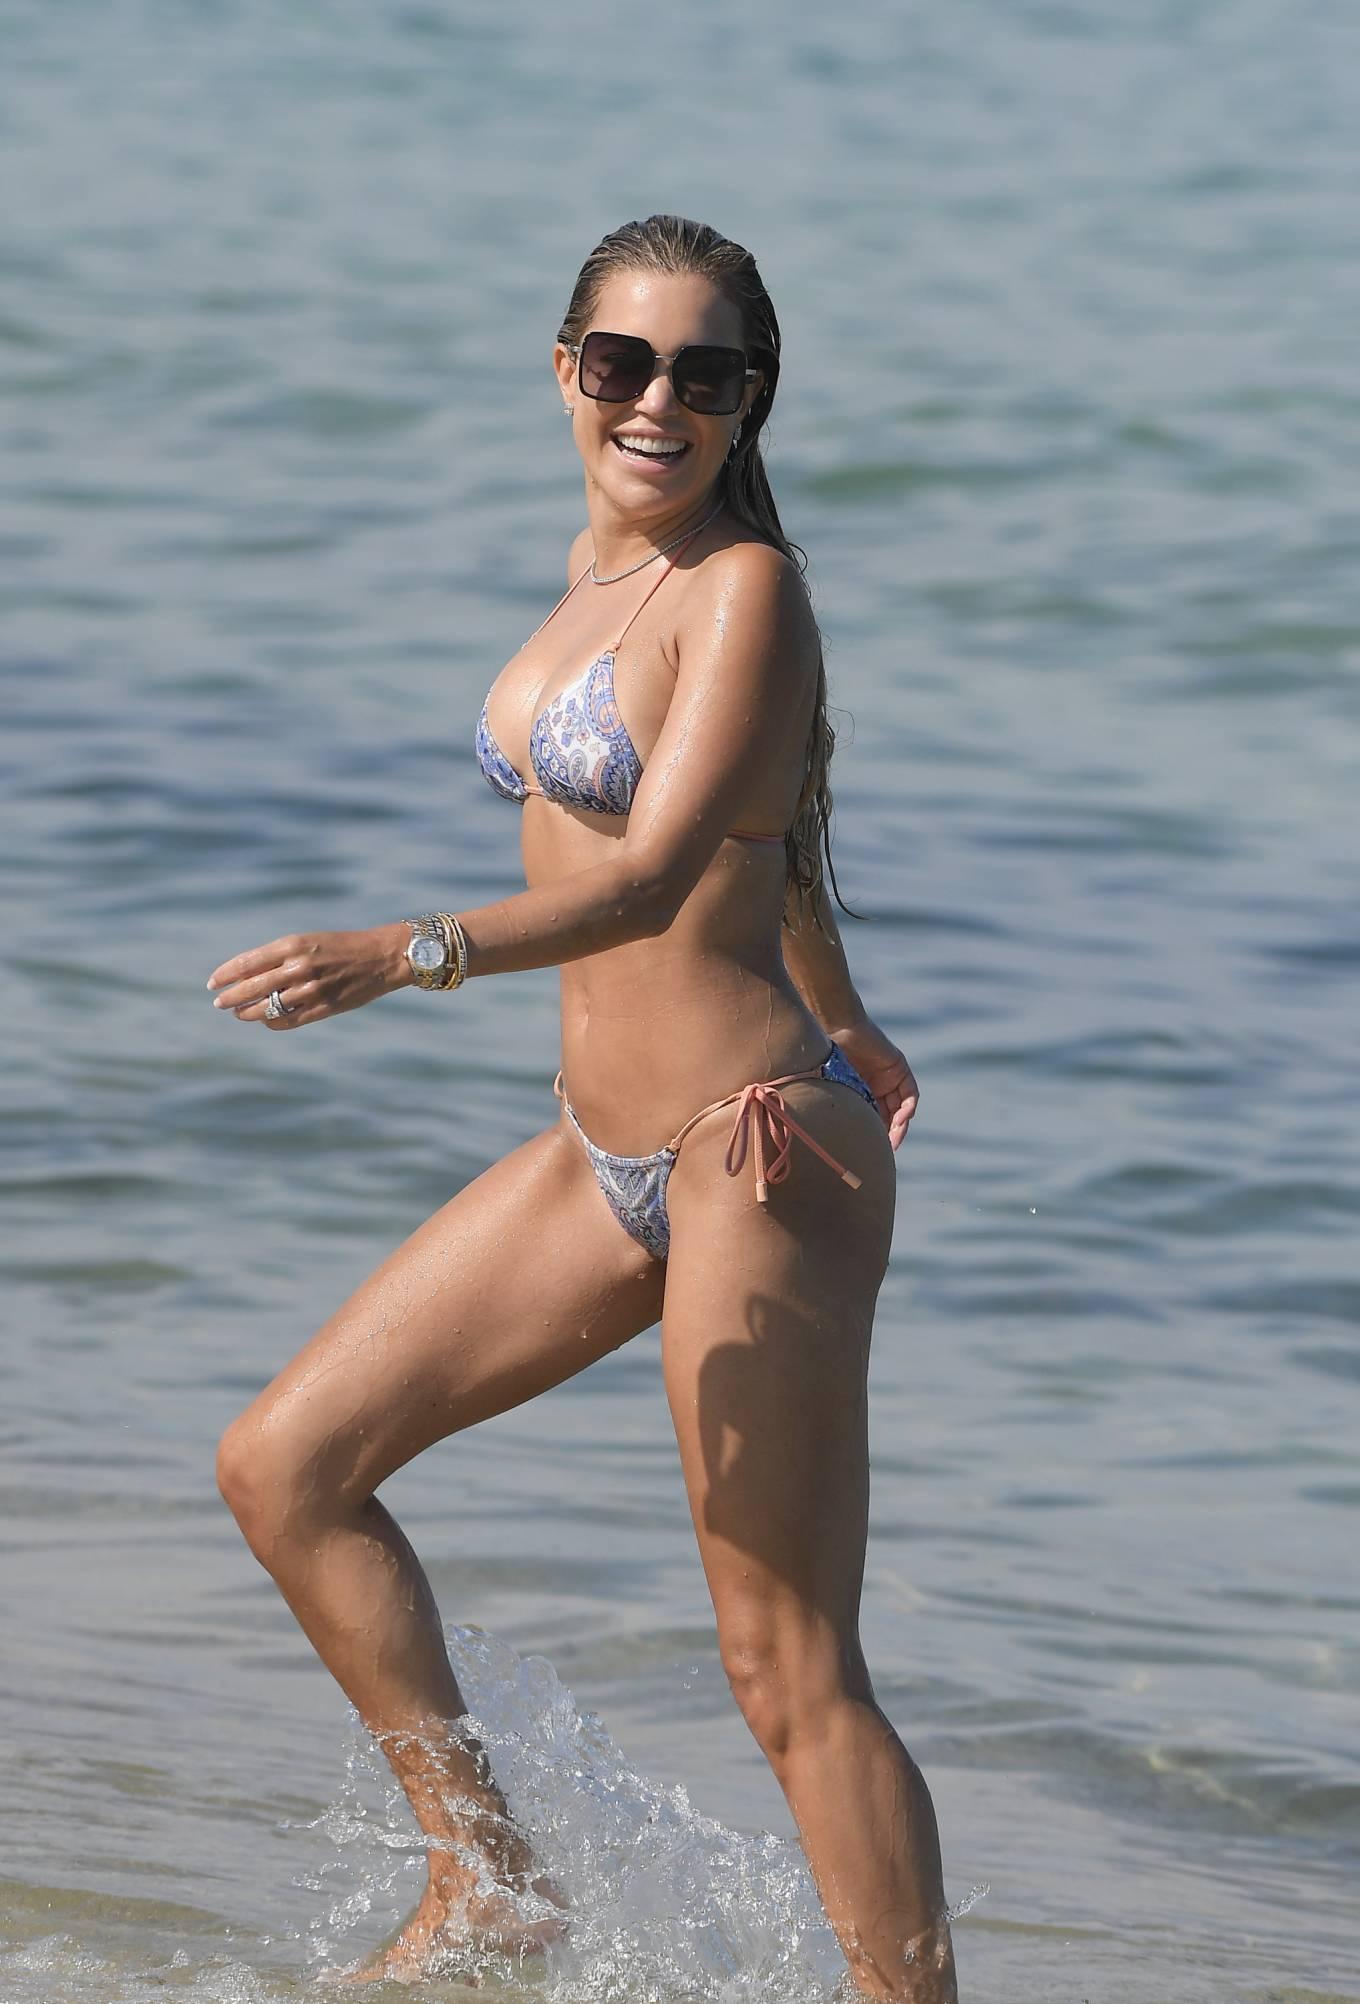 Sylvie Meis 2021 : Sylvie Meis – In a bikini with her husband Niclas Castello on the beach La Réserve in Ramatuelle-16